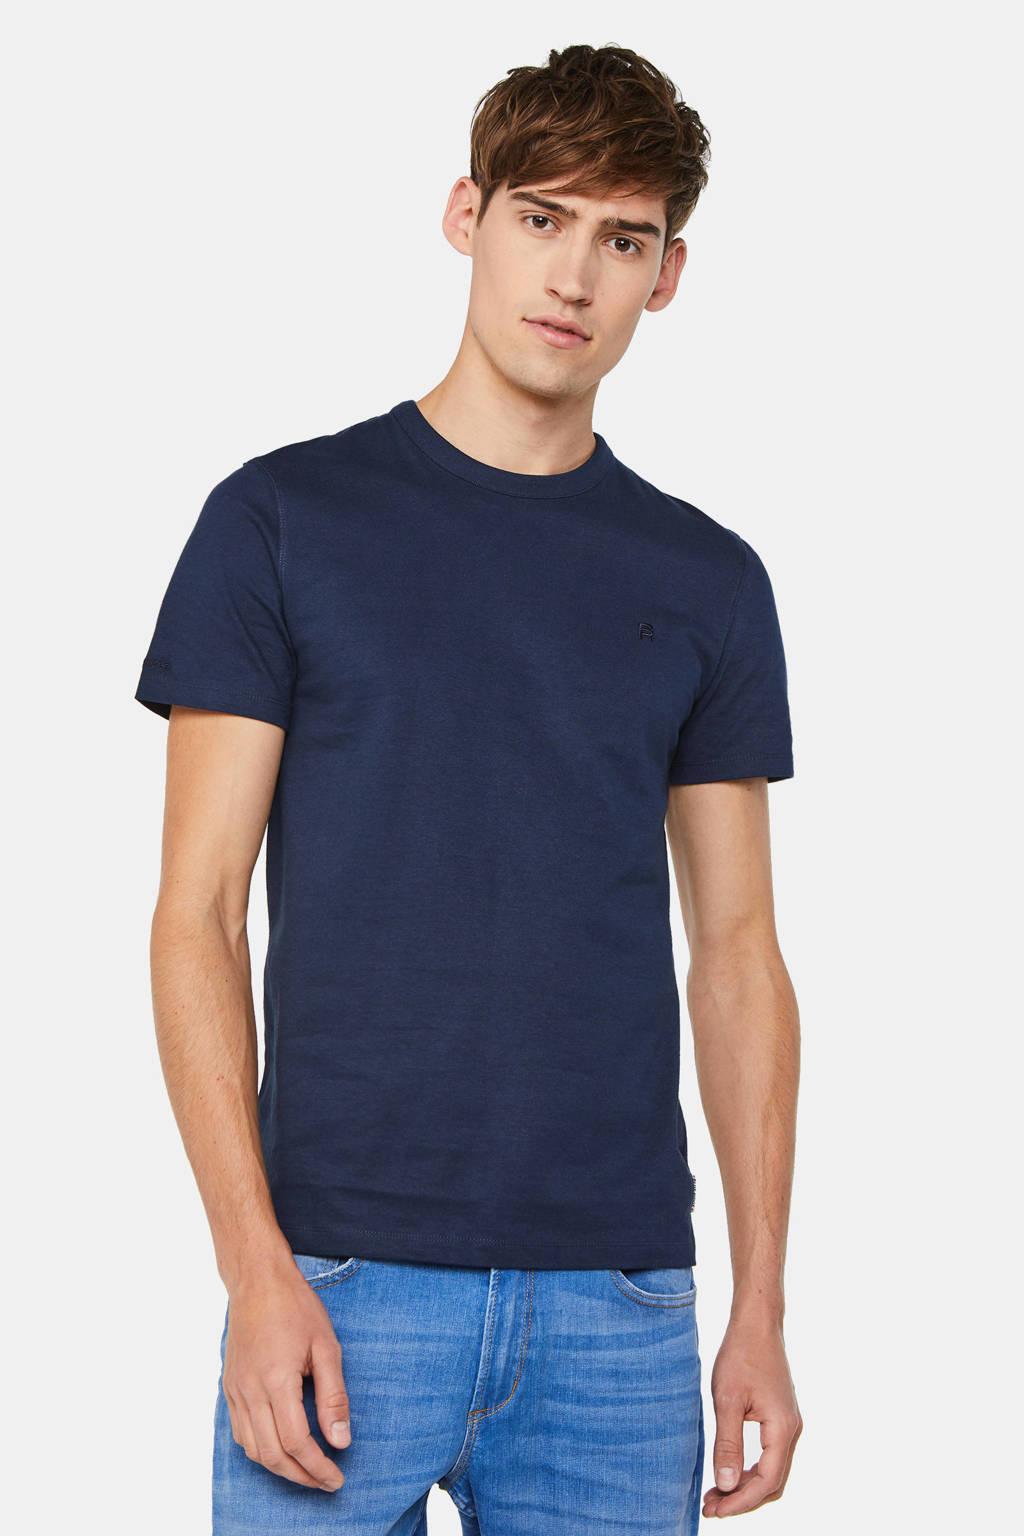 WE Fashion Blue Ridge T-shirt royal navy, Royal Navy